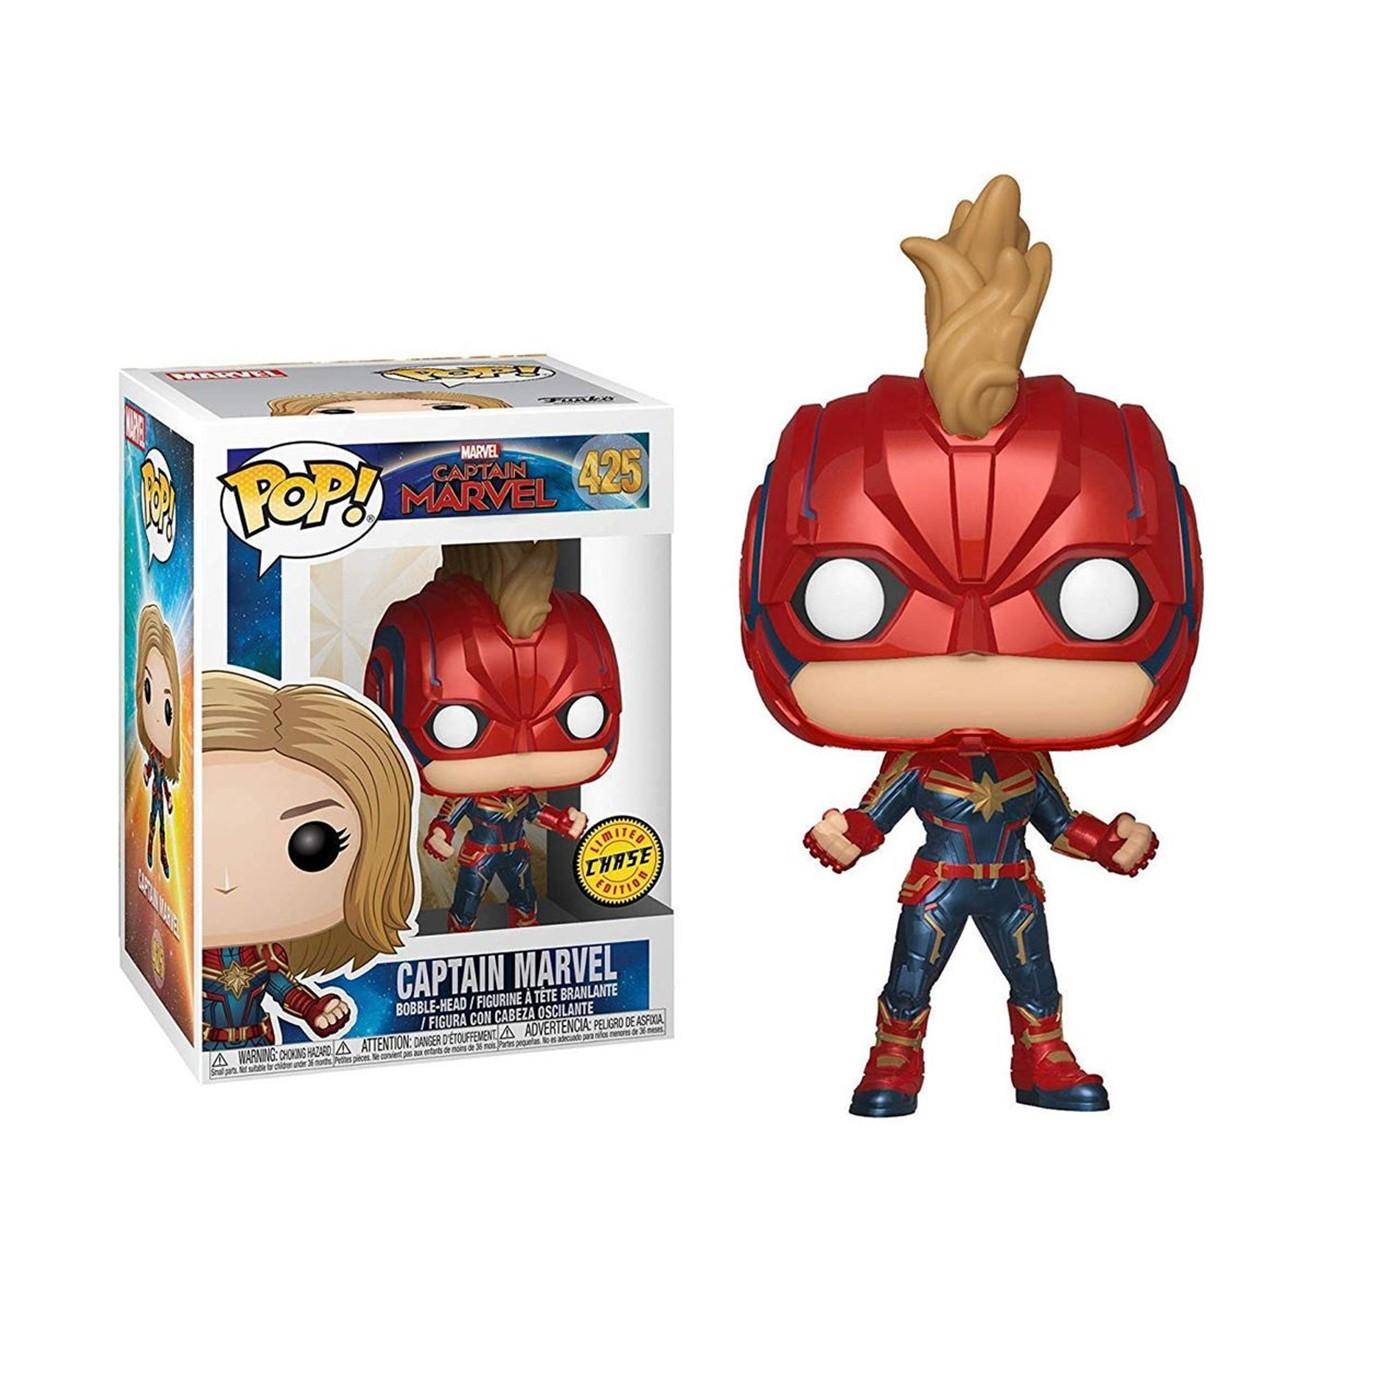 Pop! Marvel: Captain Marvel - Captain Marvel Chase